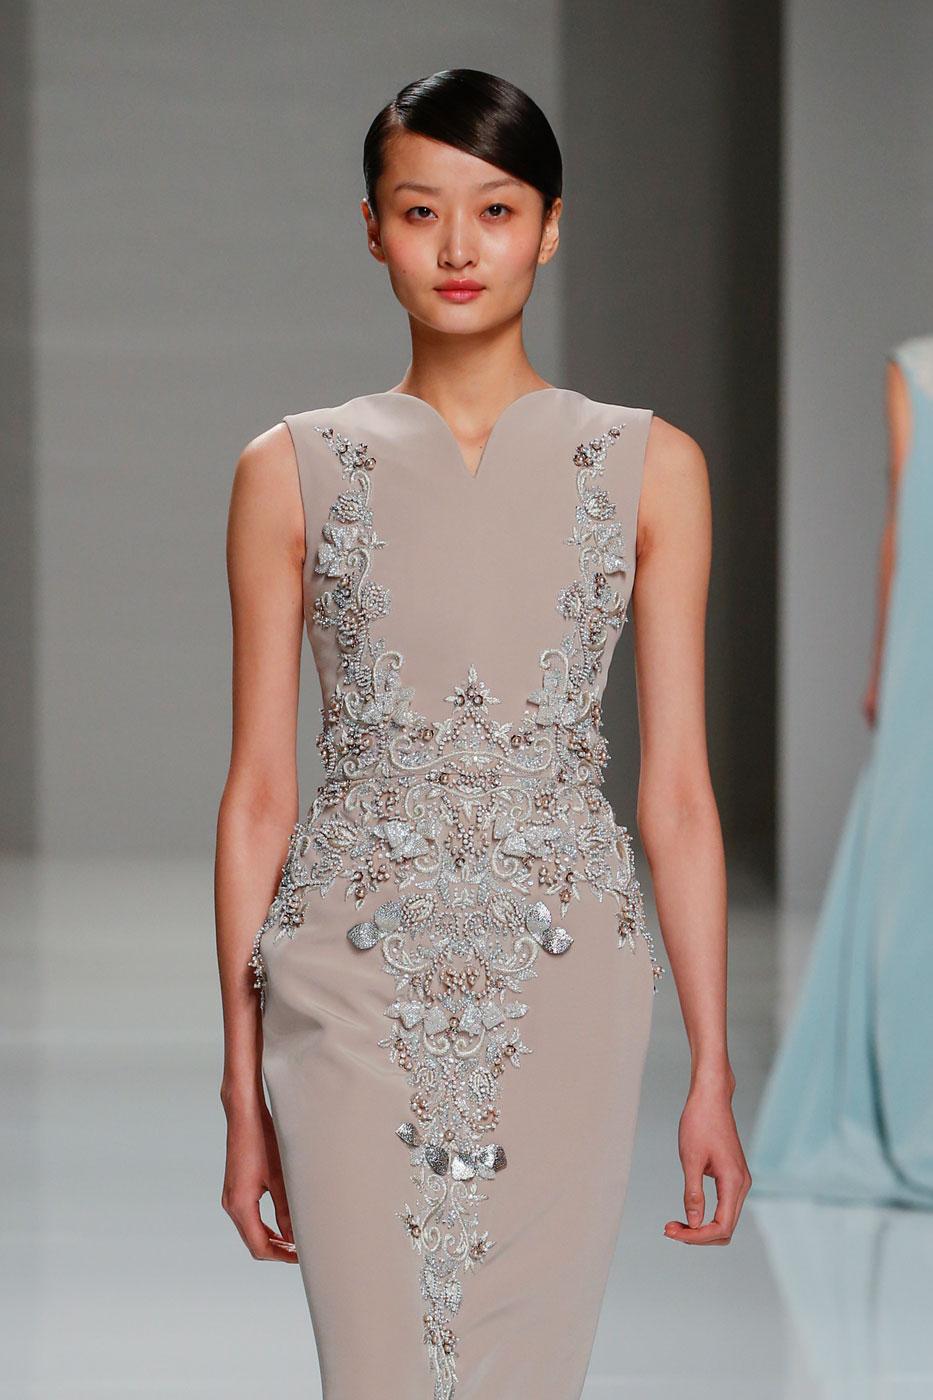 Georges-Hobeika-fashion-runway-show-haute-couture-paris-spring-2015-the-impression-40